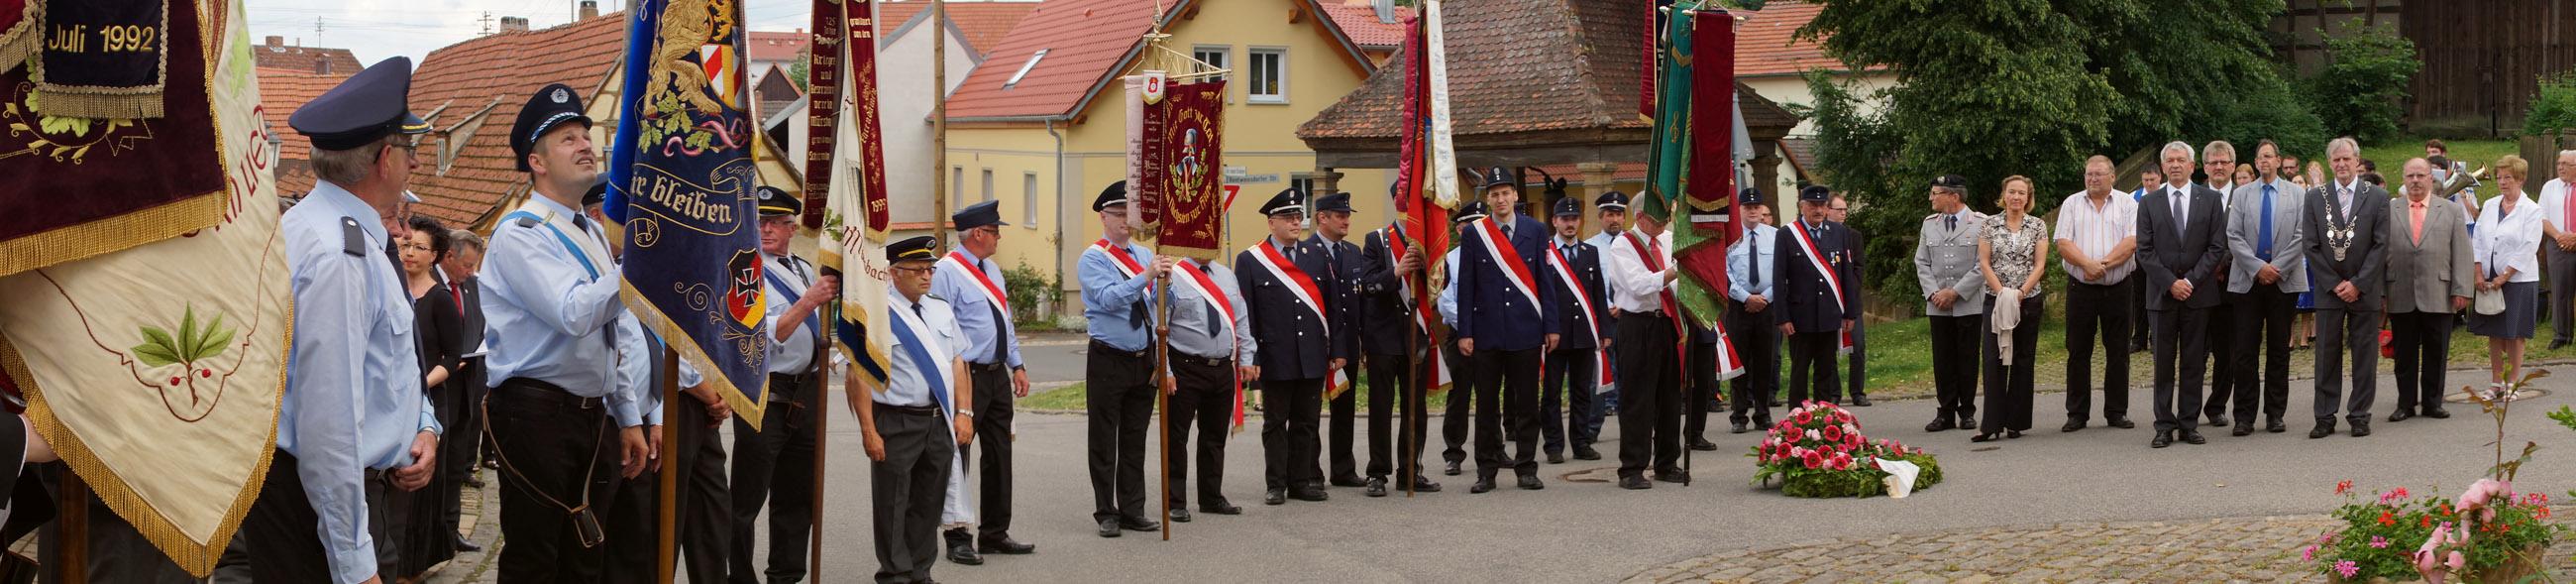 150 Jahre GV Mürsbach 2015